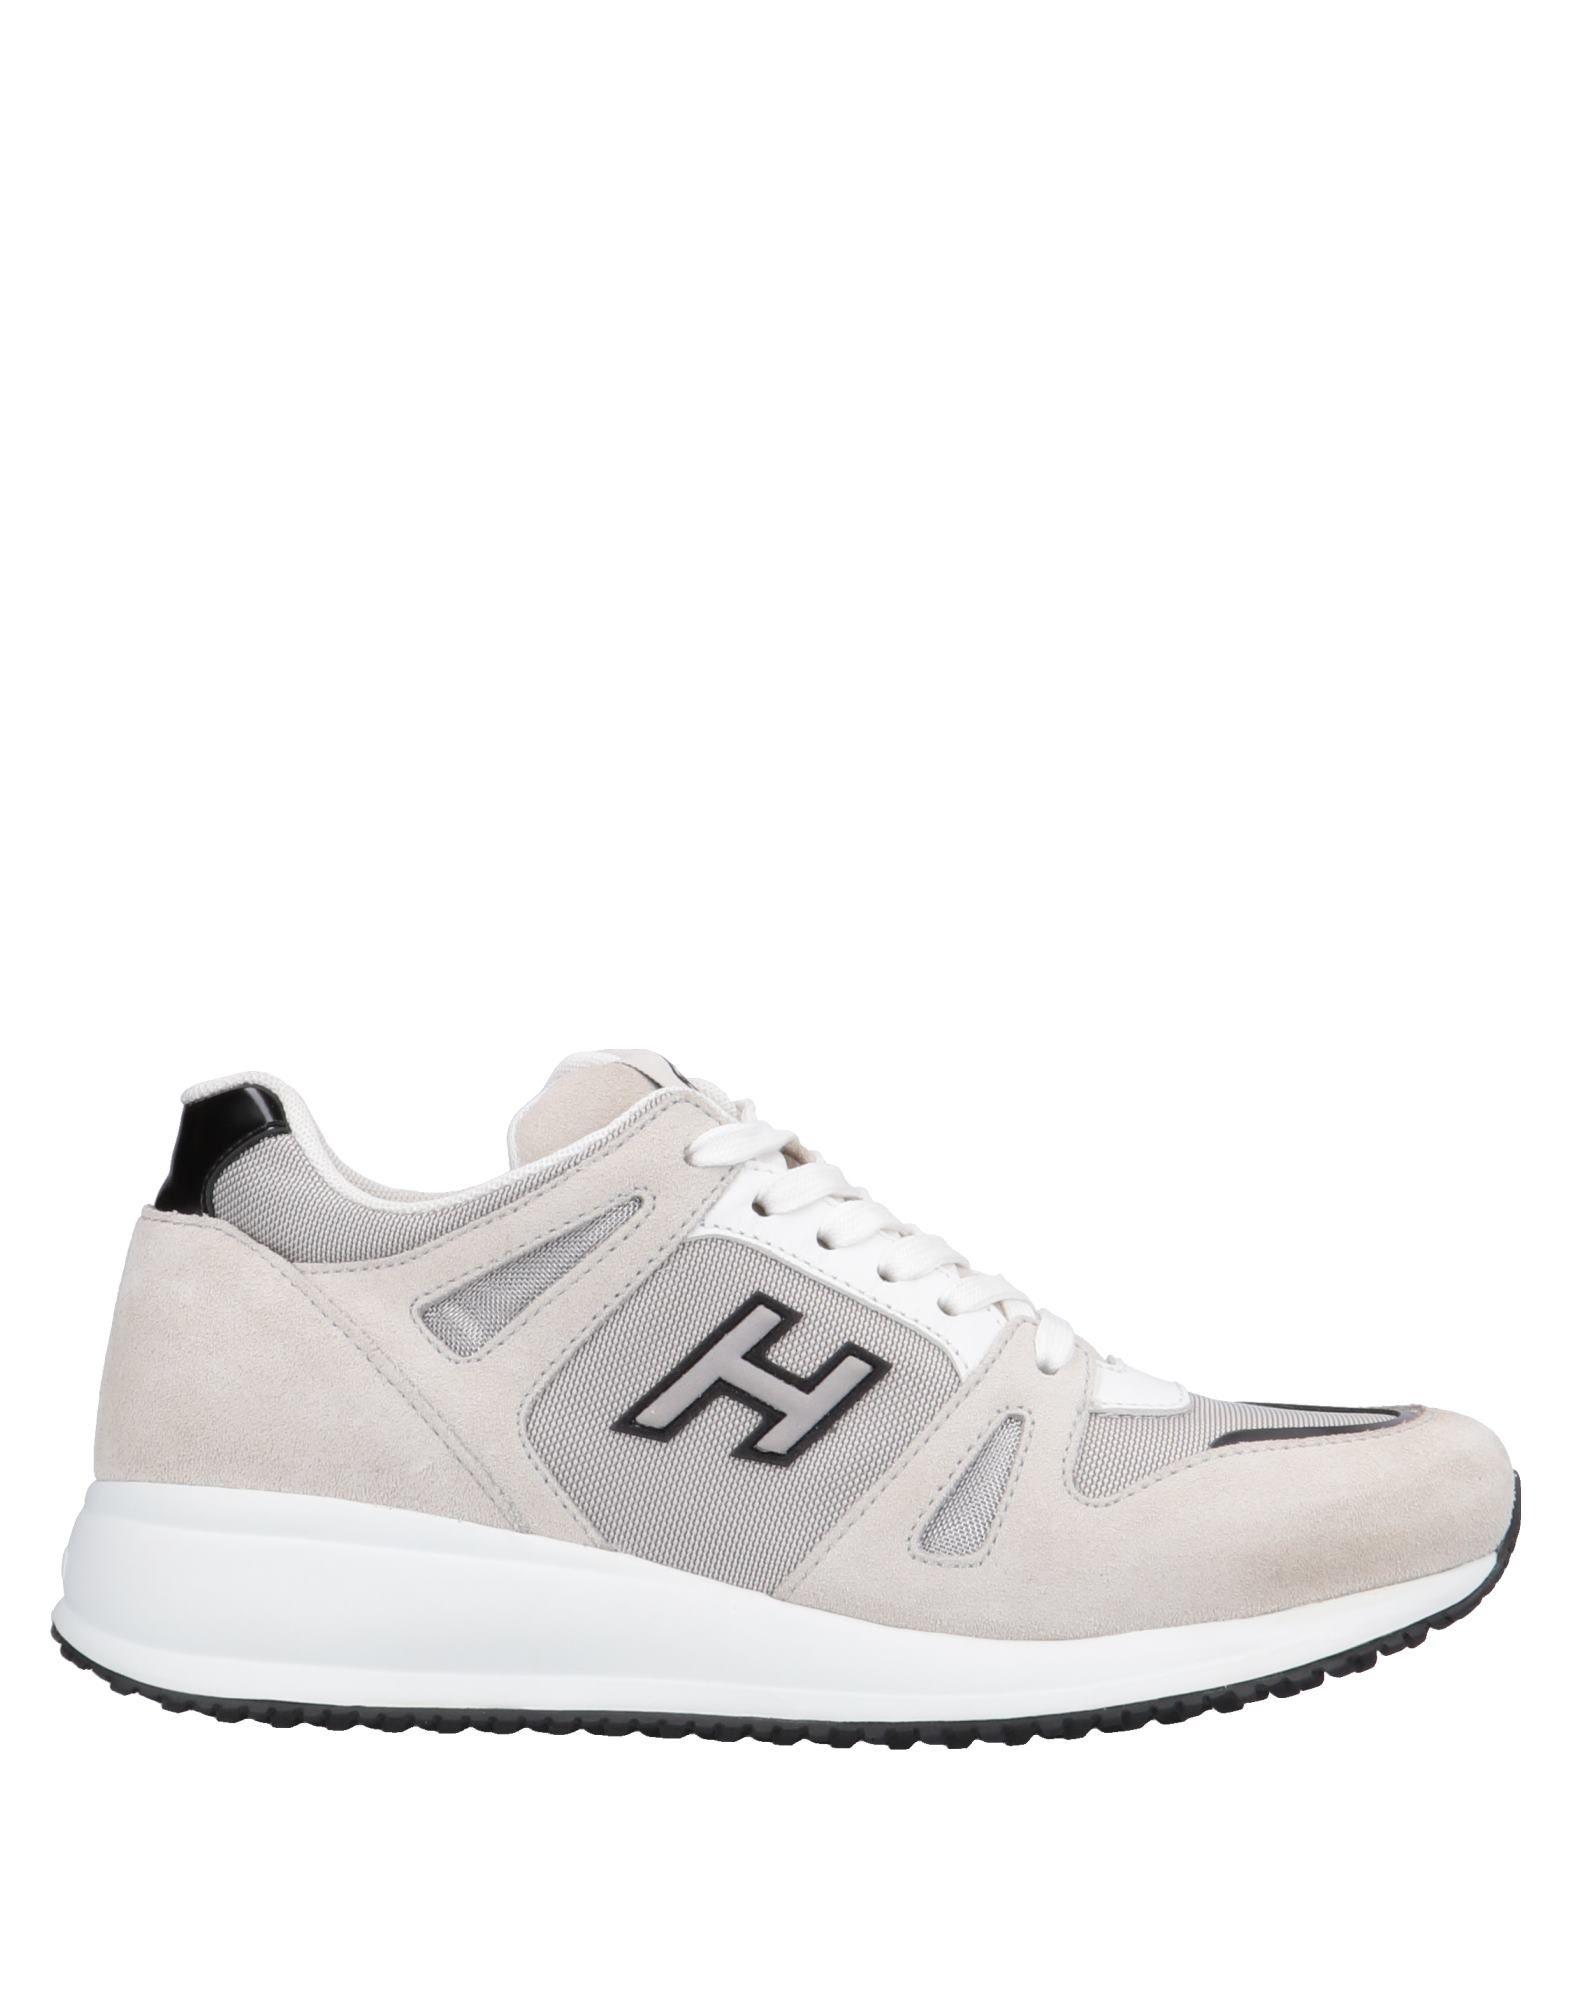 Hogan Sneakers Herren  beliebte 11563919OC Gute Qualität beliebte  Schuhe cfd9ae